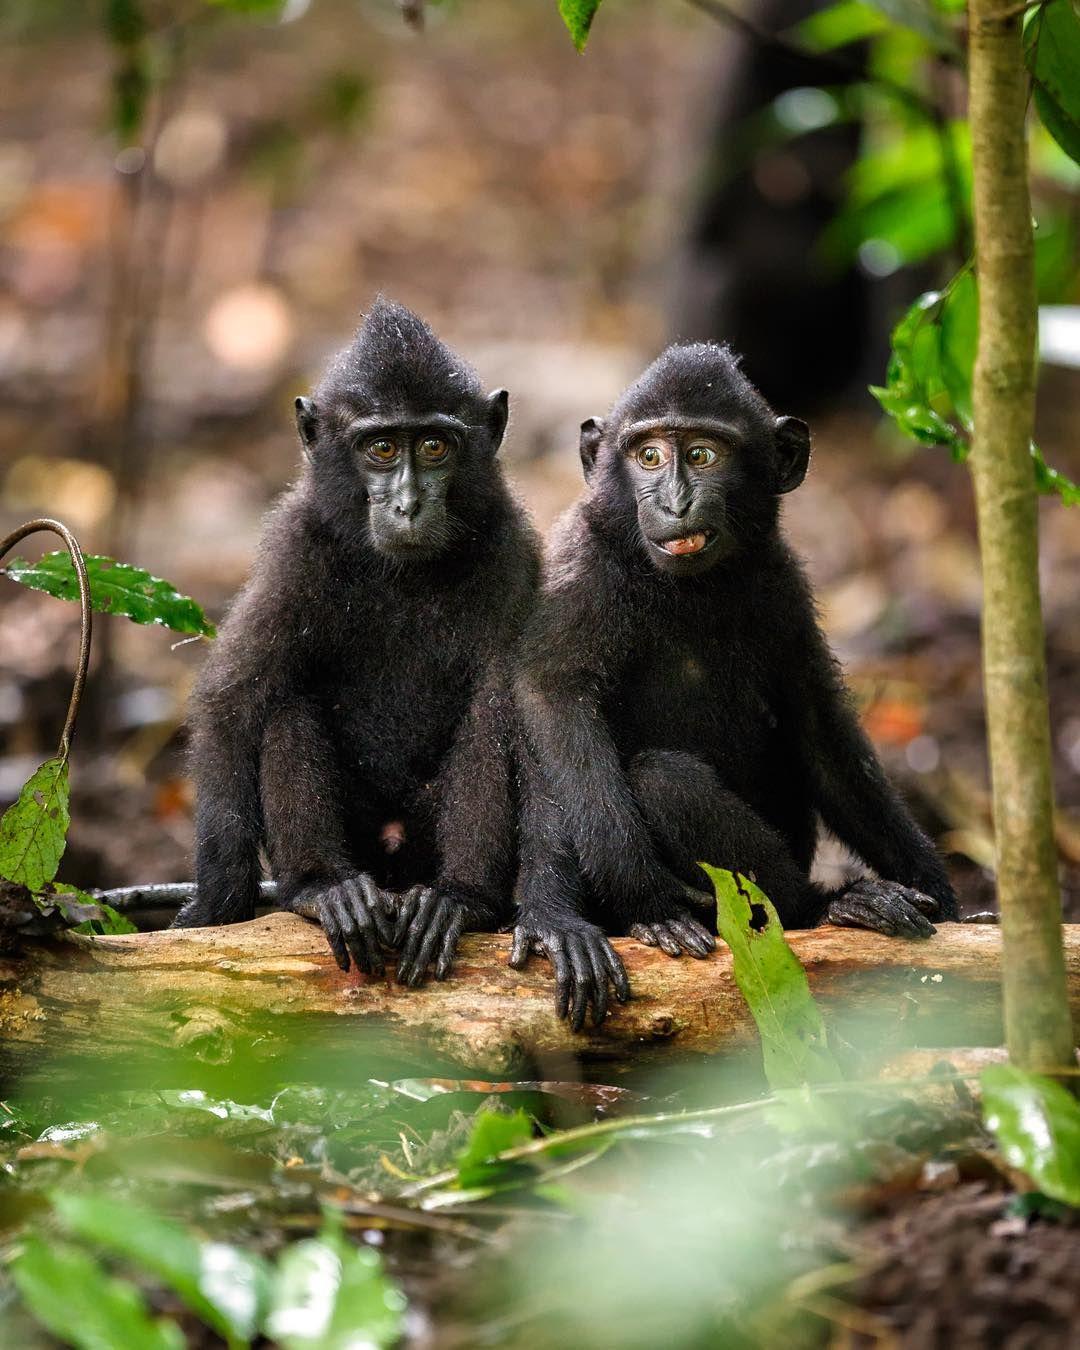 Like Us Nonhuman Primates Convey Moods Through Facial